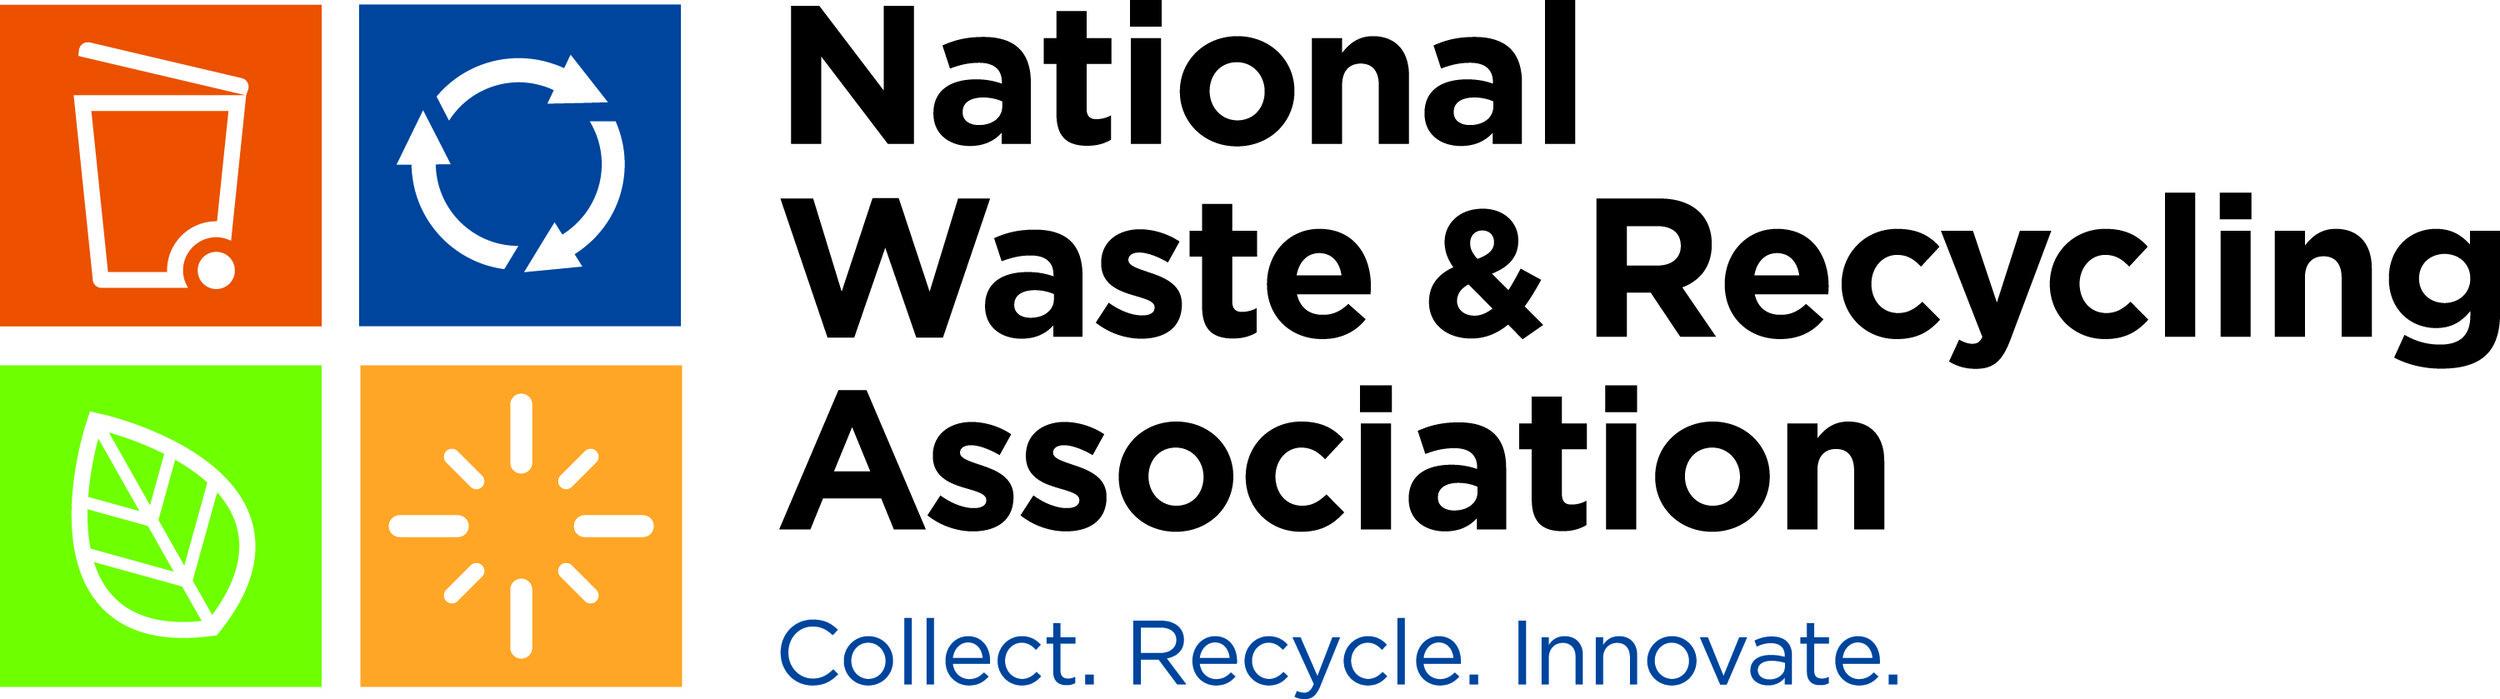 Waste_Recycling_CMYK.jpg